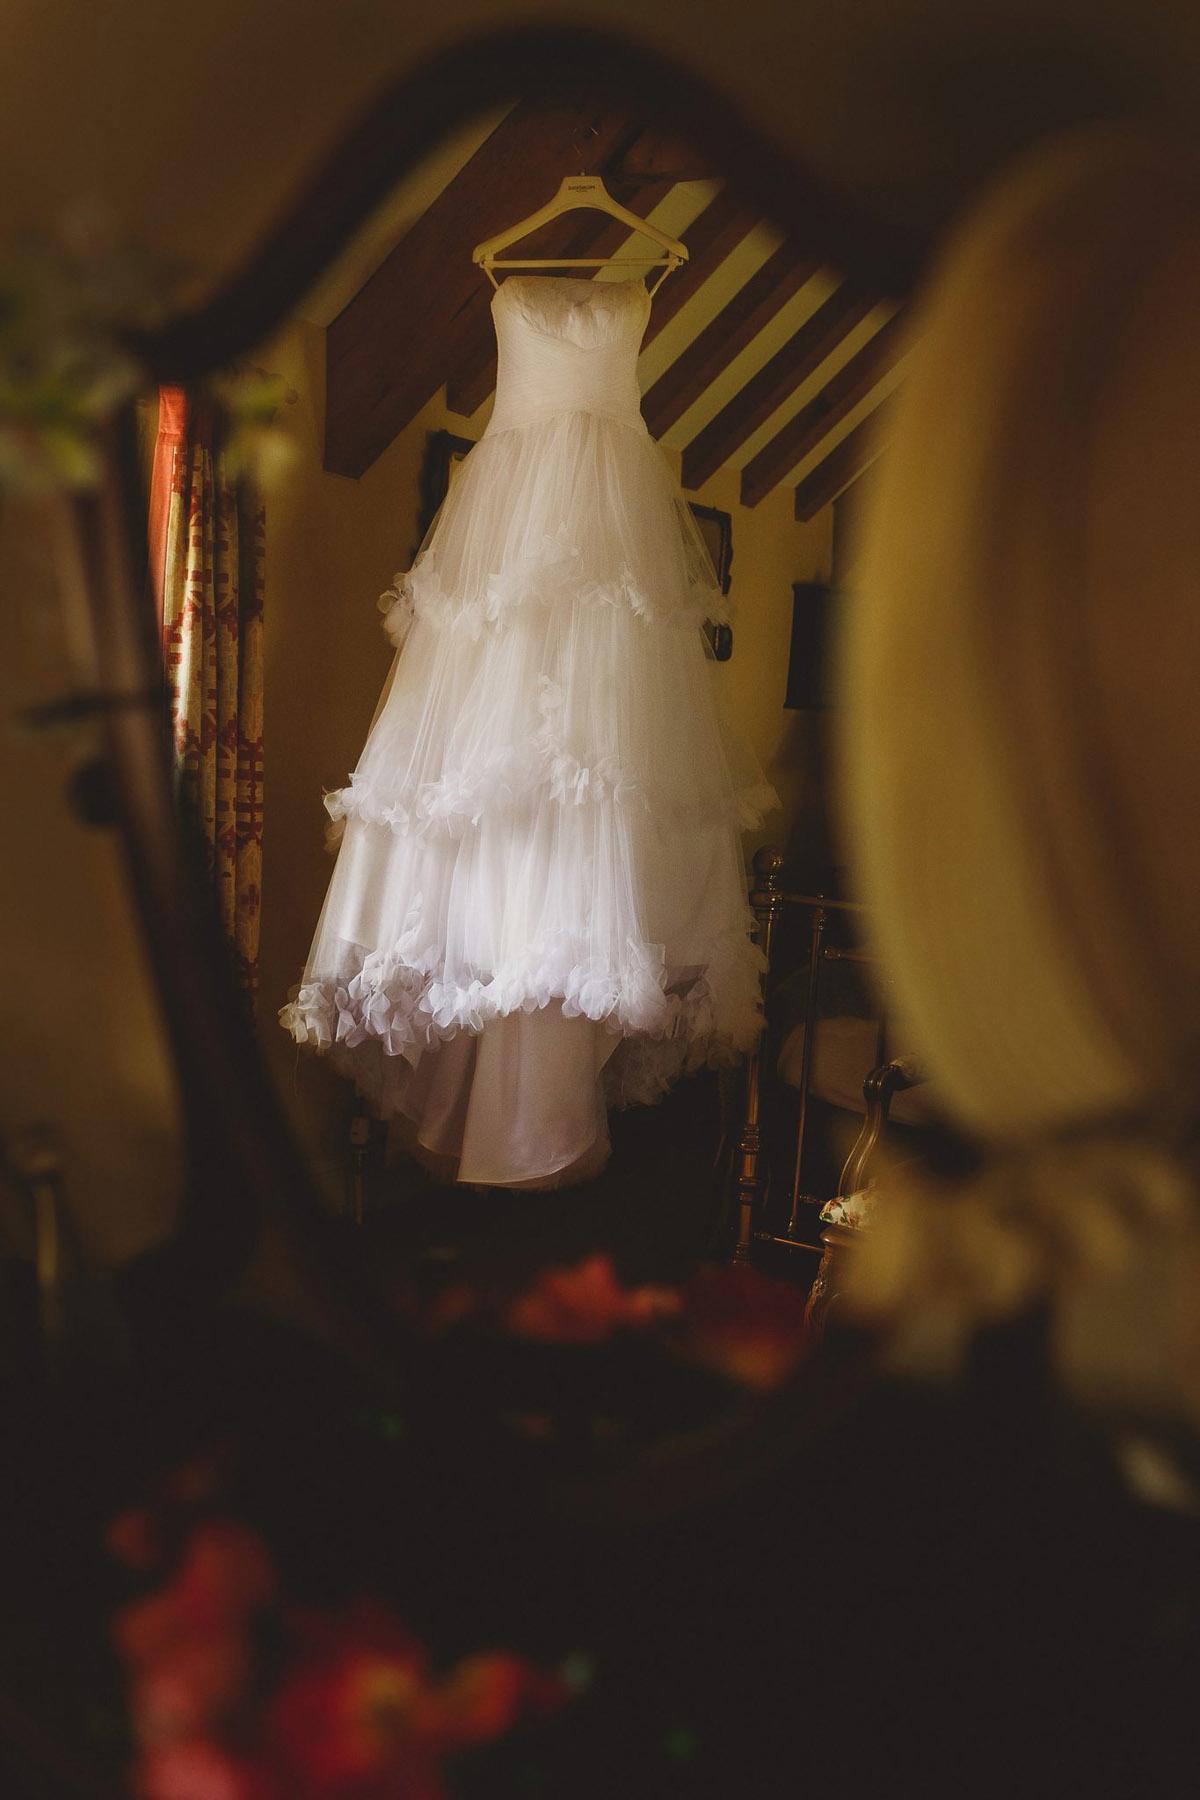 oxfordshire-wedding-photographer-005